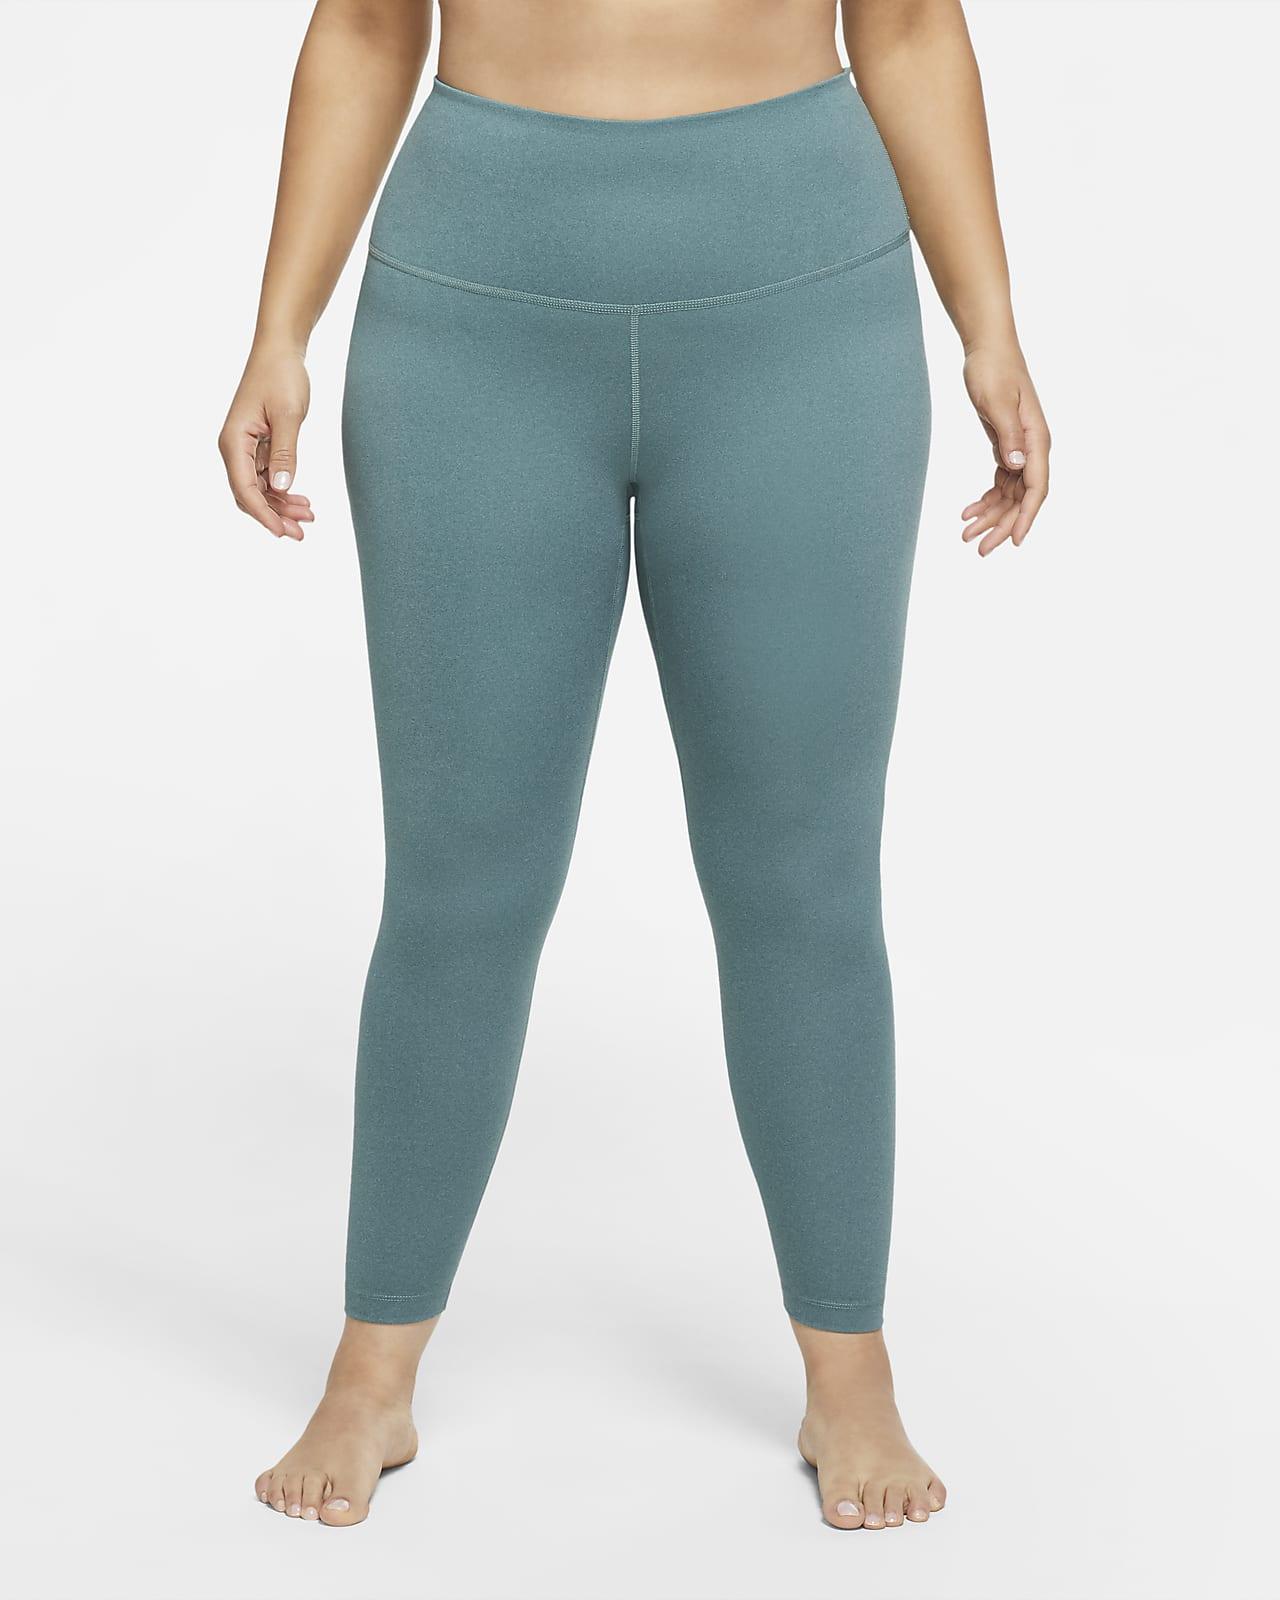 Nike Yoga Women's 7/8 Tights (Plus Size